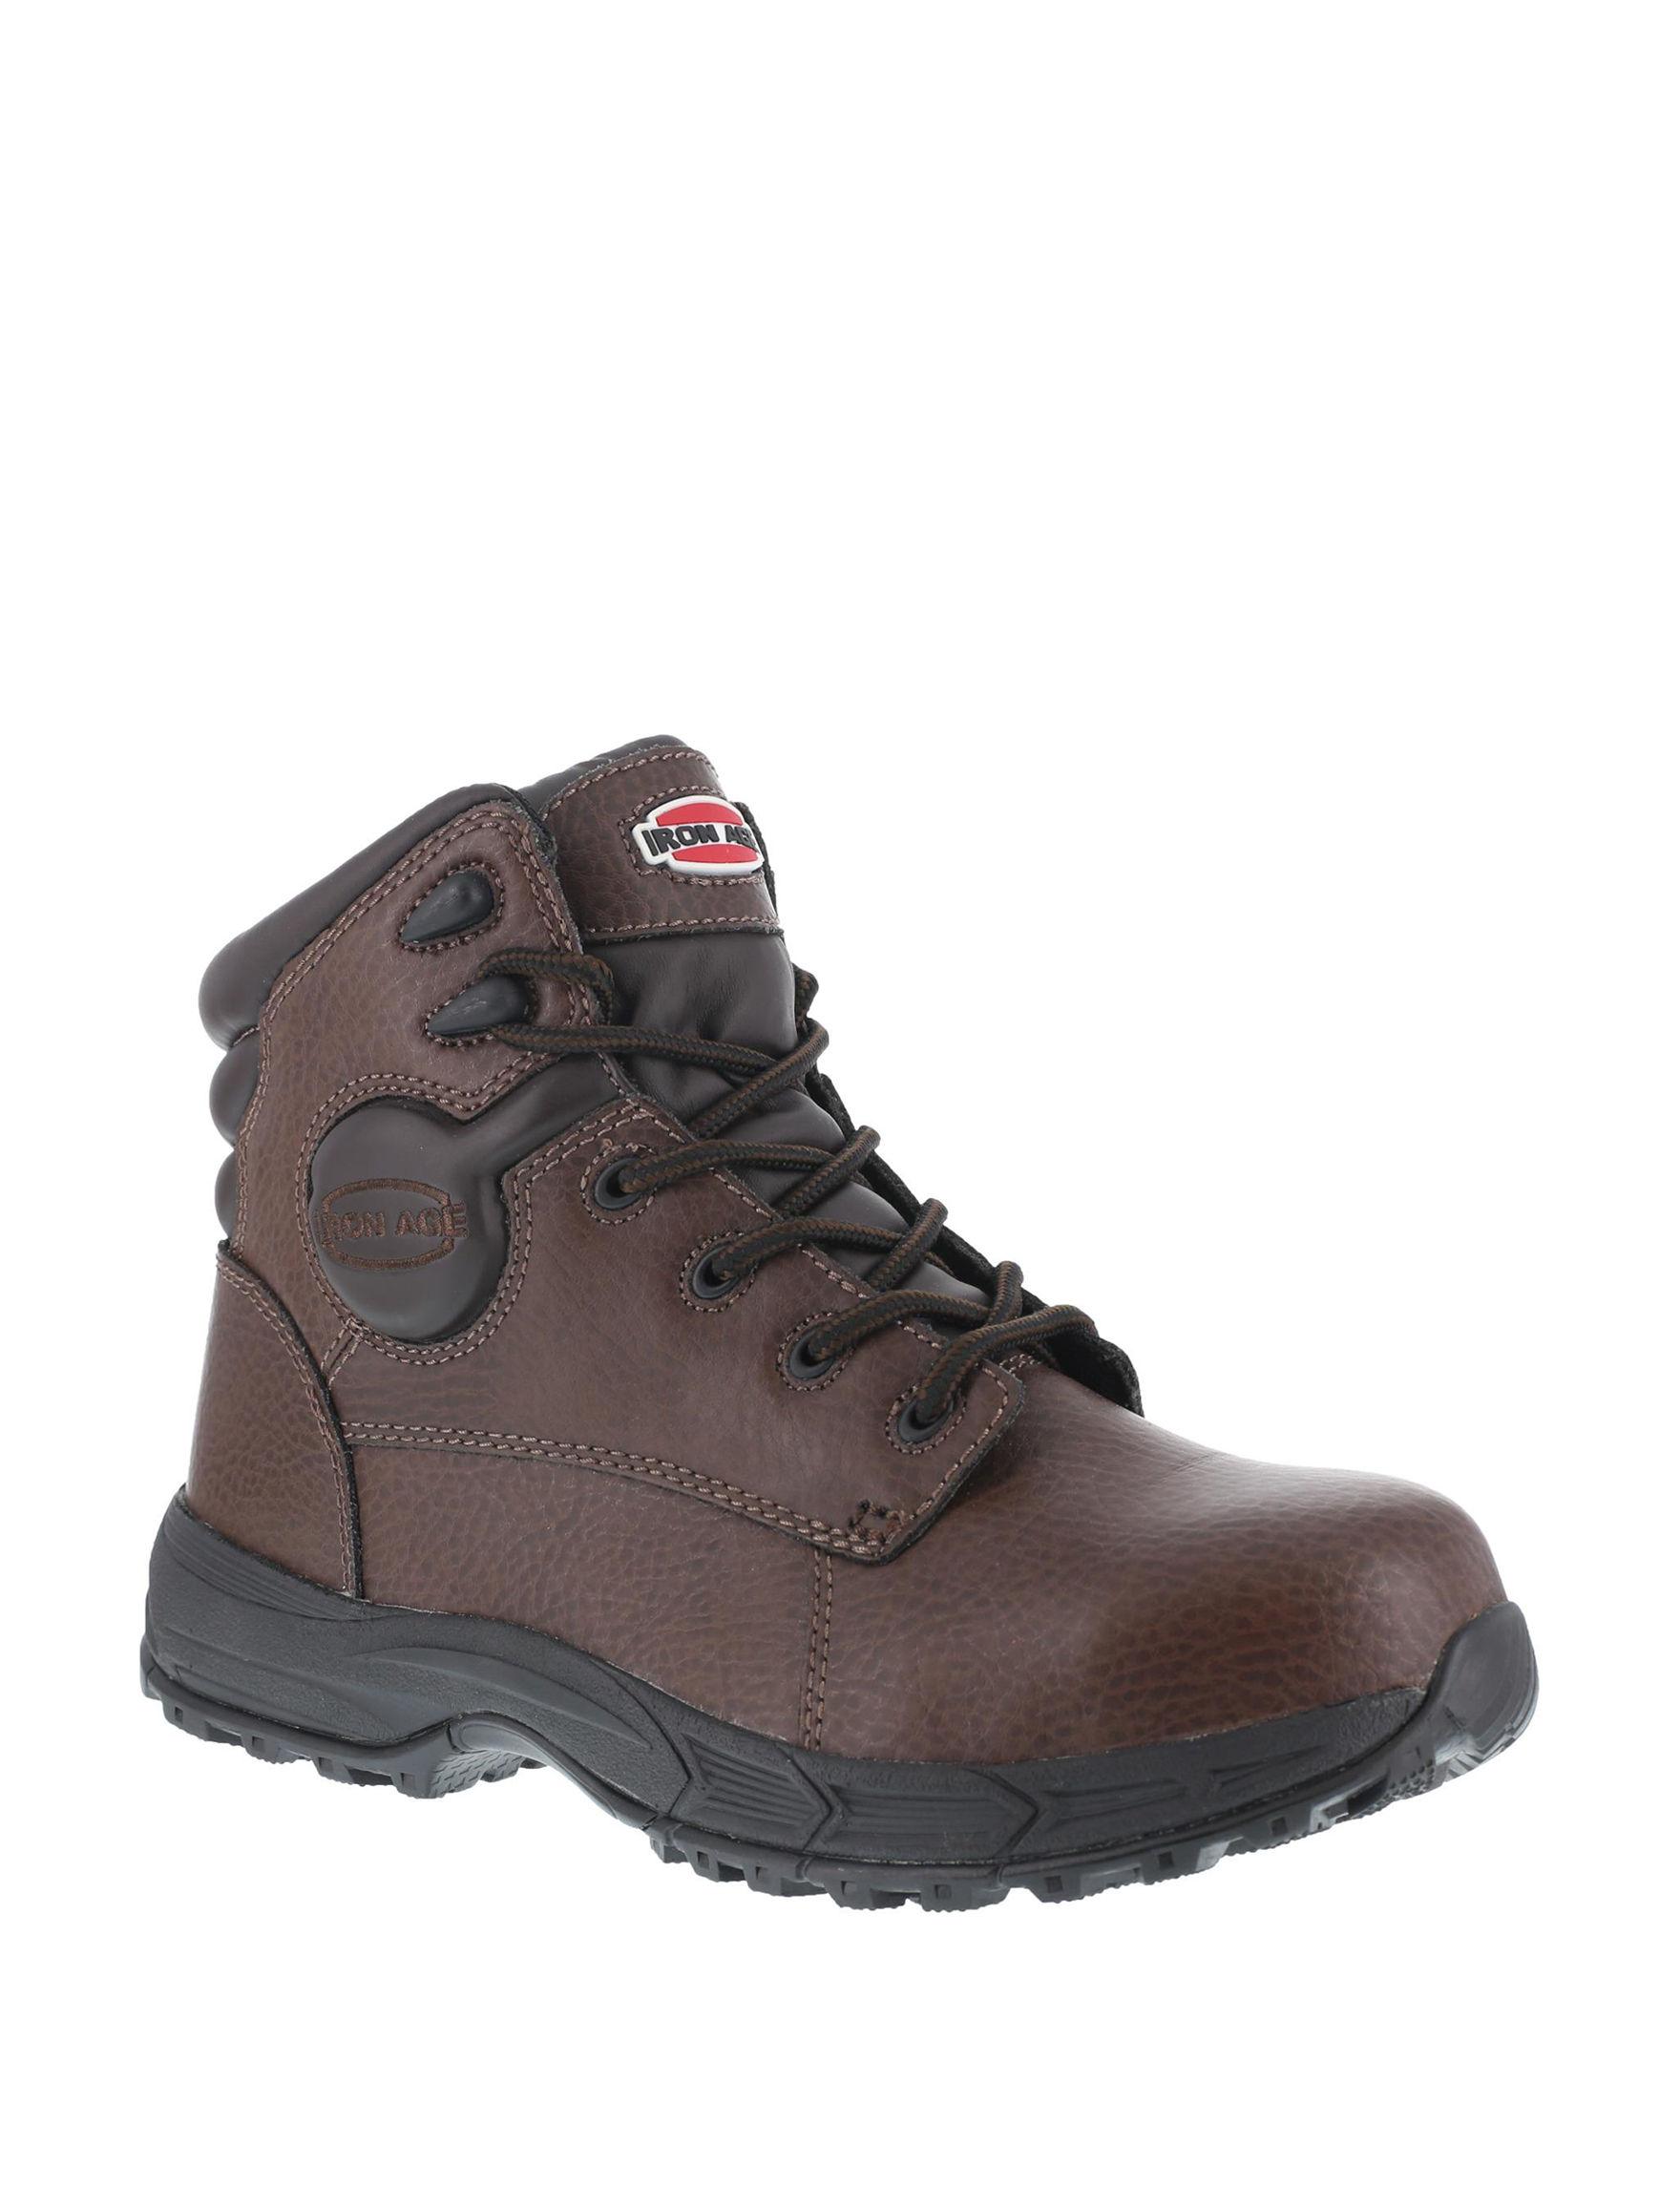 Iron Age Brown Slip Resistant Steel Toe